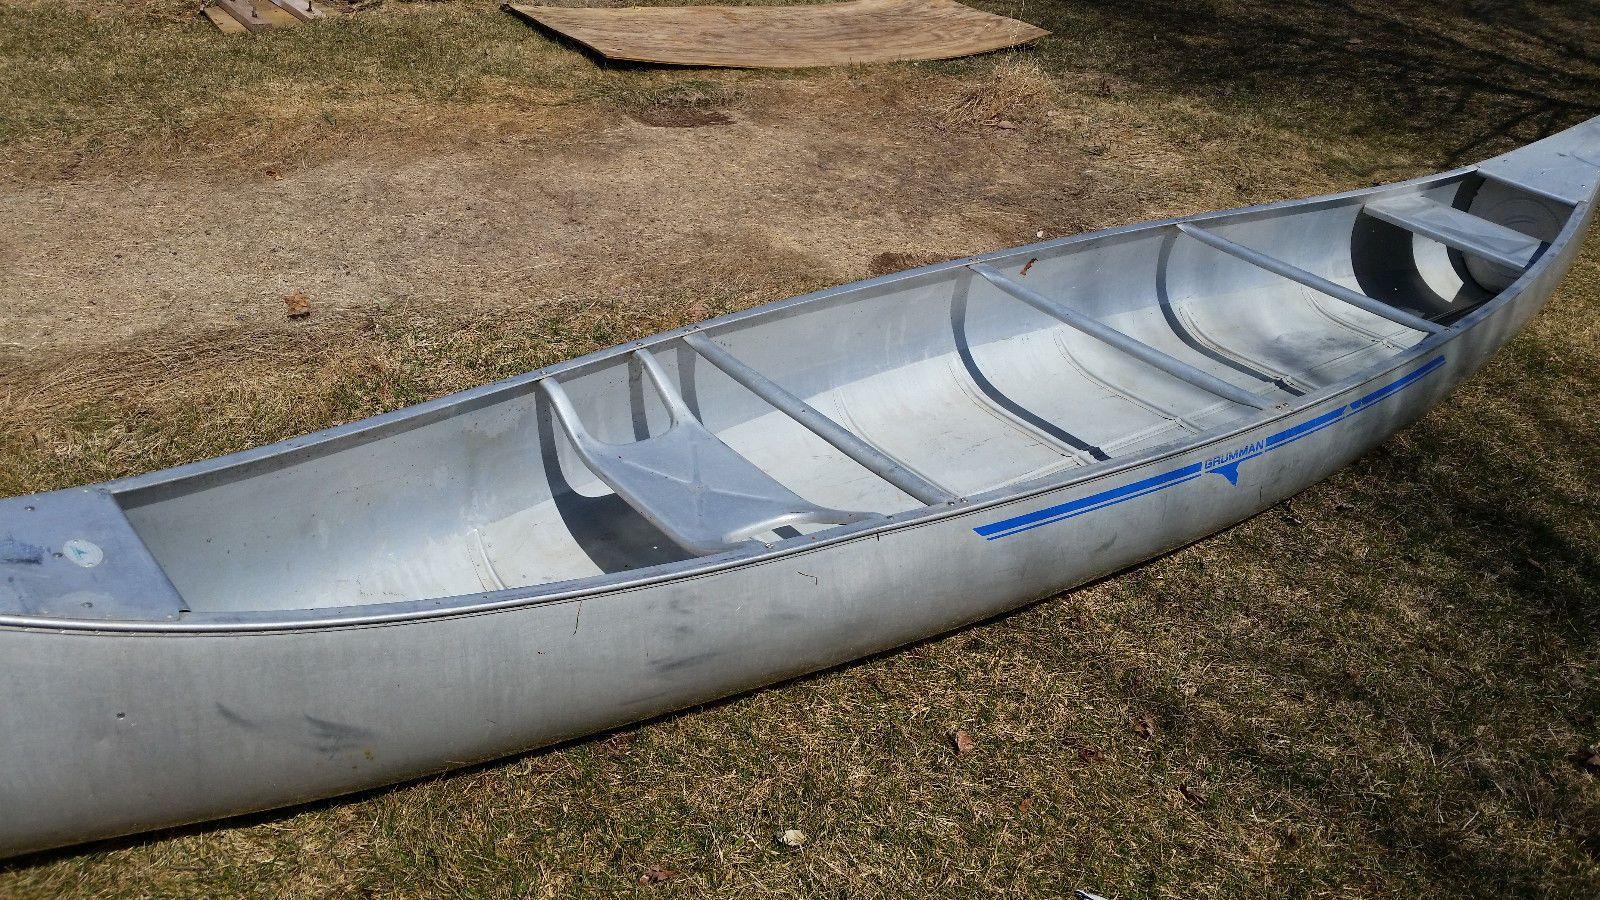 100+ Aluminum Square Stern Canoe – yasminroohi